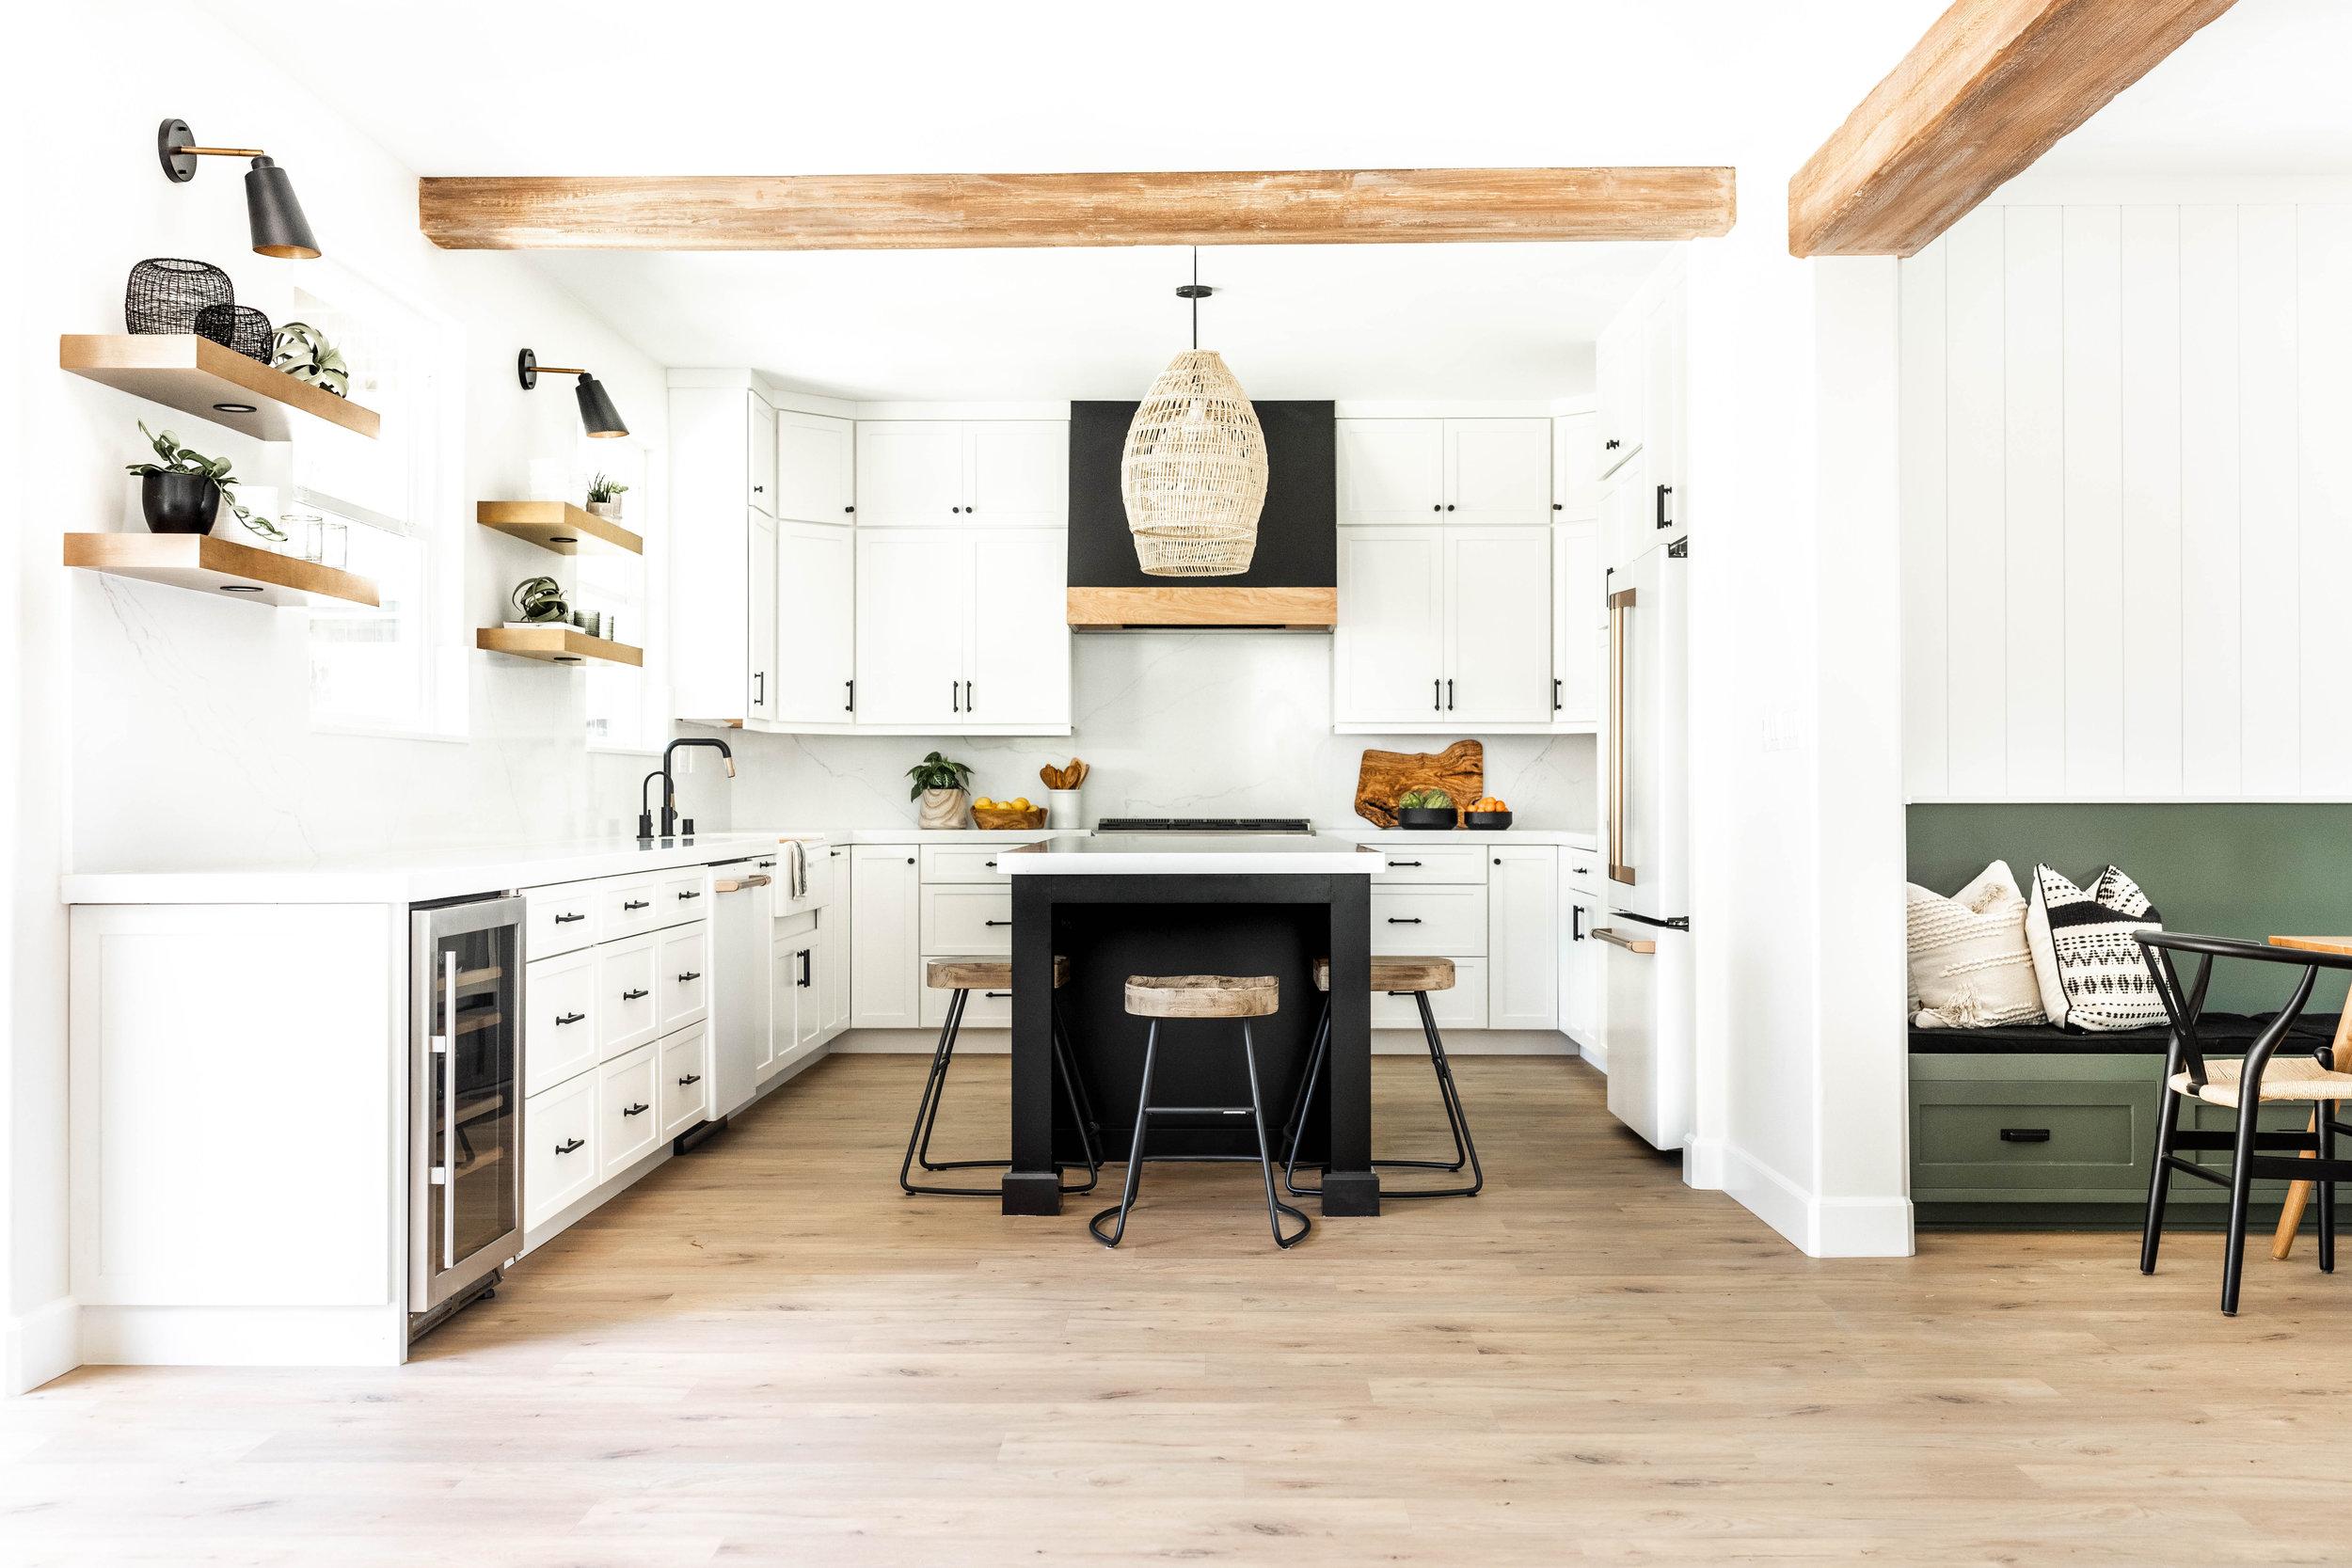 Morgan_Mullen_Design_Blue_Water_San_Diego_Interior_Designer_The_Zamudios-12.jpg